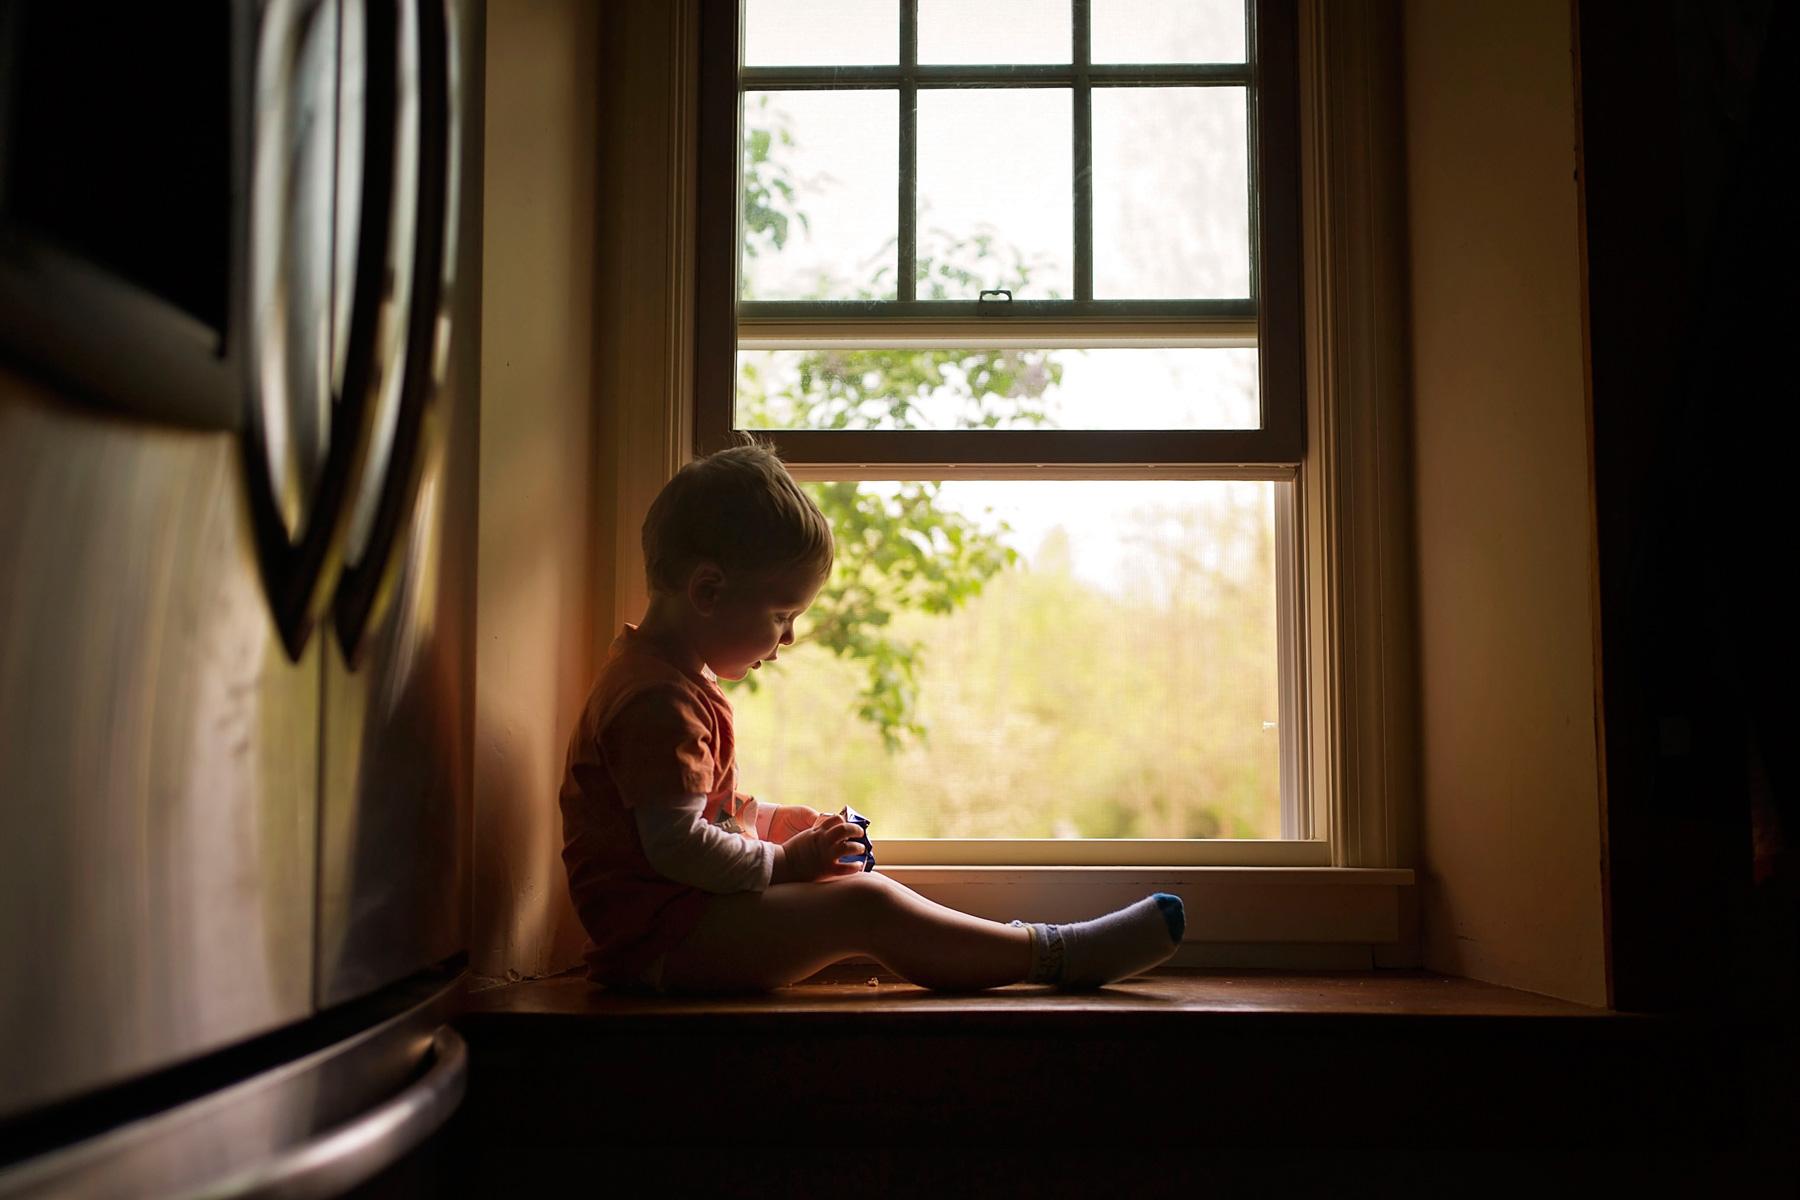 little boy having a snack on windowsill